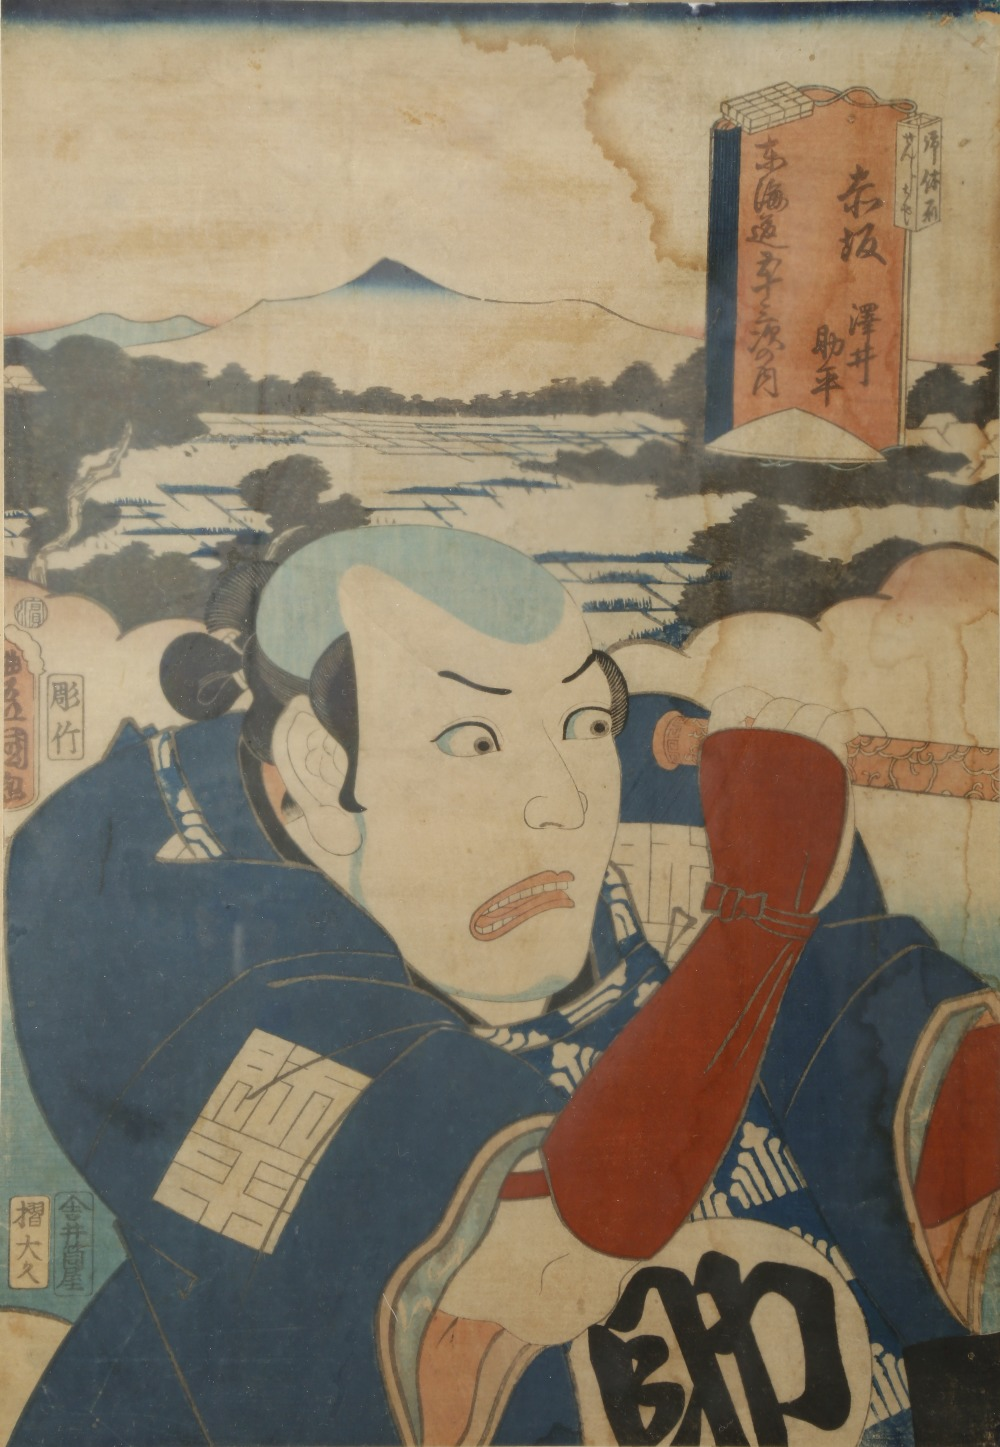 A COLLECTION OF TWELVE JAPANESE WOODBLOCK PRINTS BY UTAGAWA KUNISADA (1786-1864) MEIJI PERIOD, - Image 6 of 12